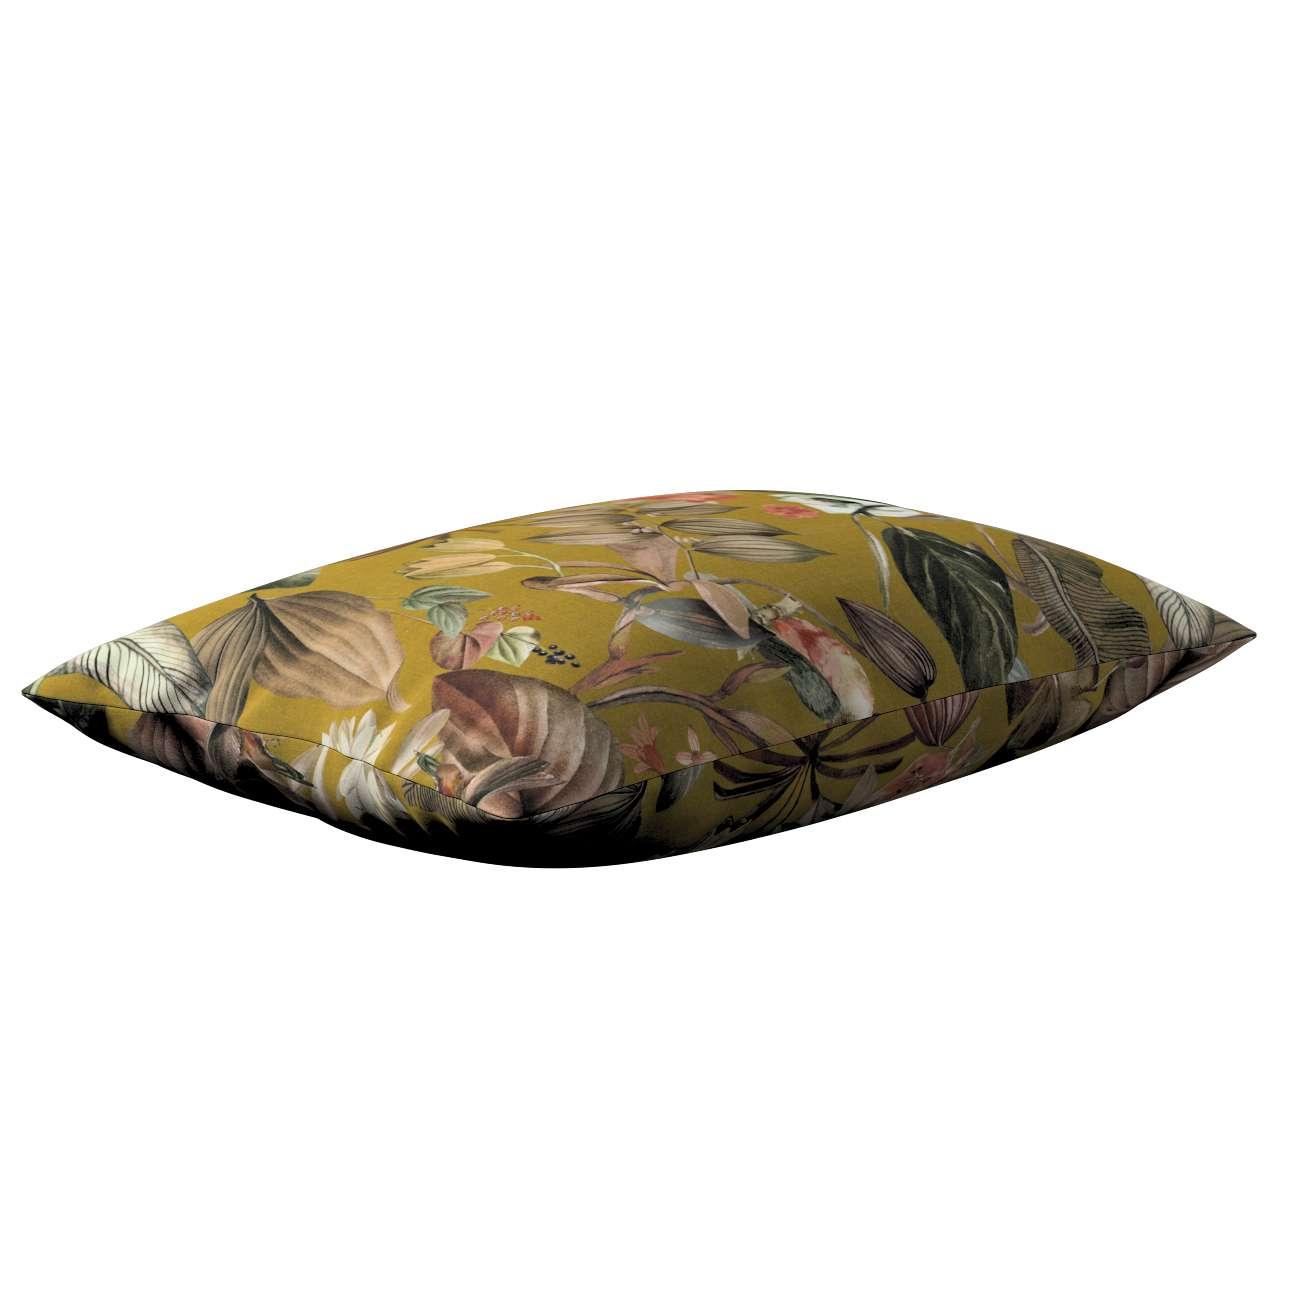 Kinga - potah na polštář jednoduchý obdélníkový v kolekci Abigail, látka: 143-09